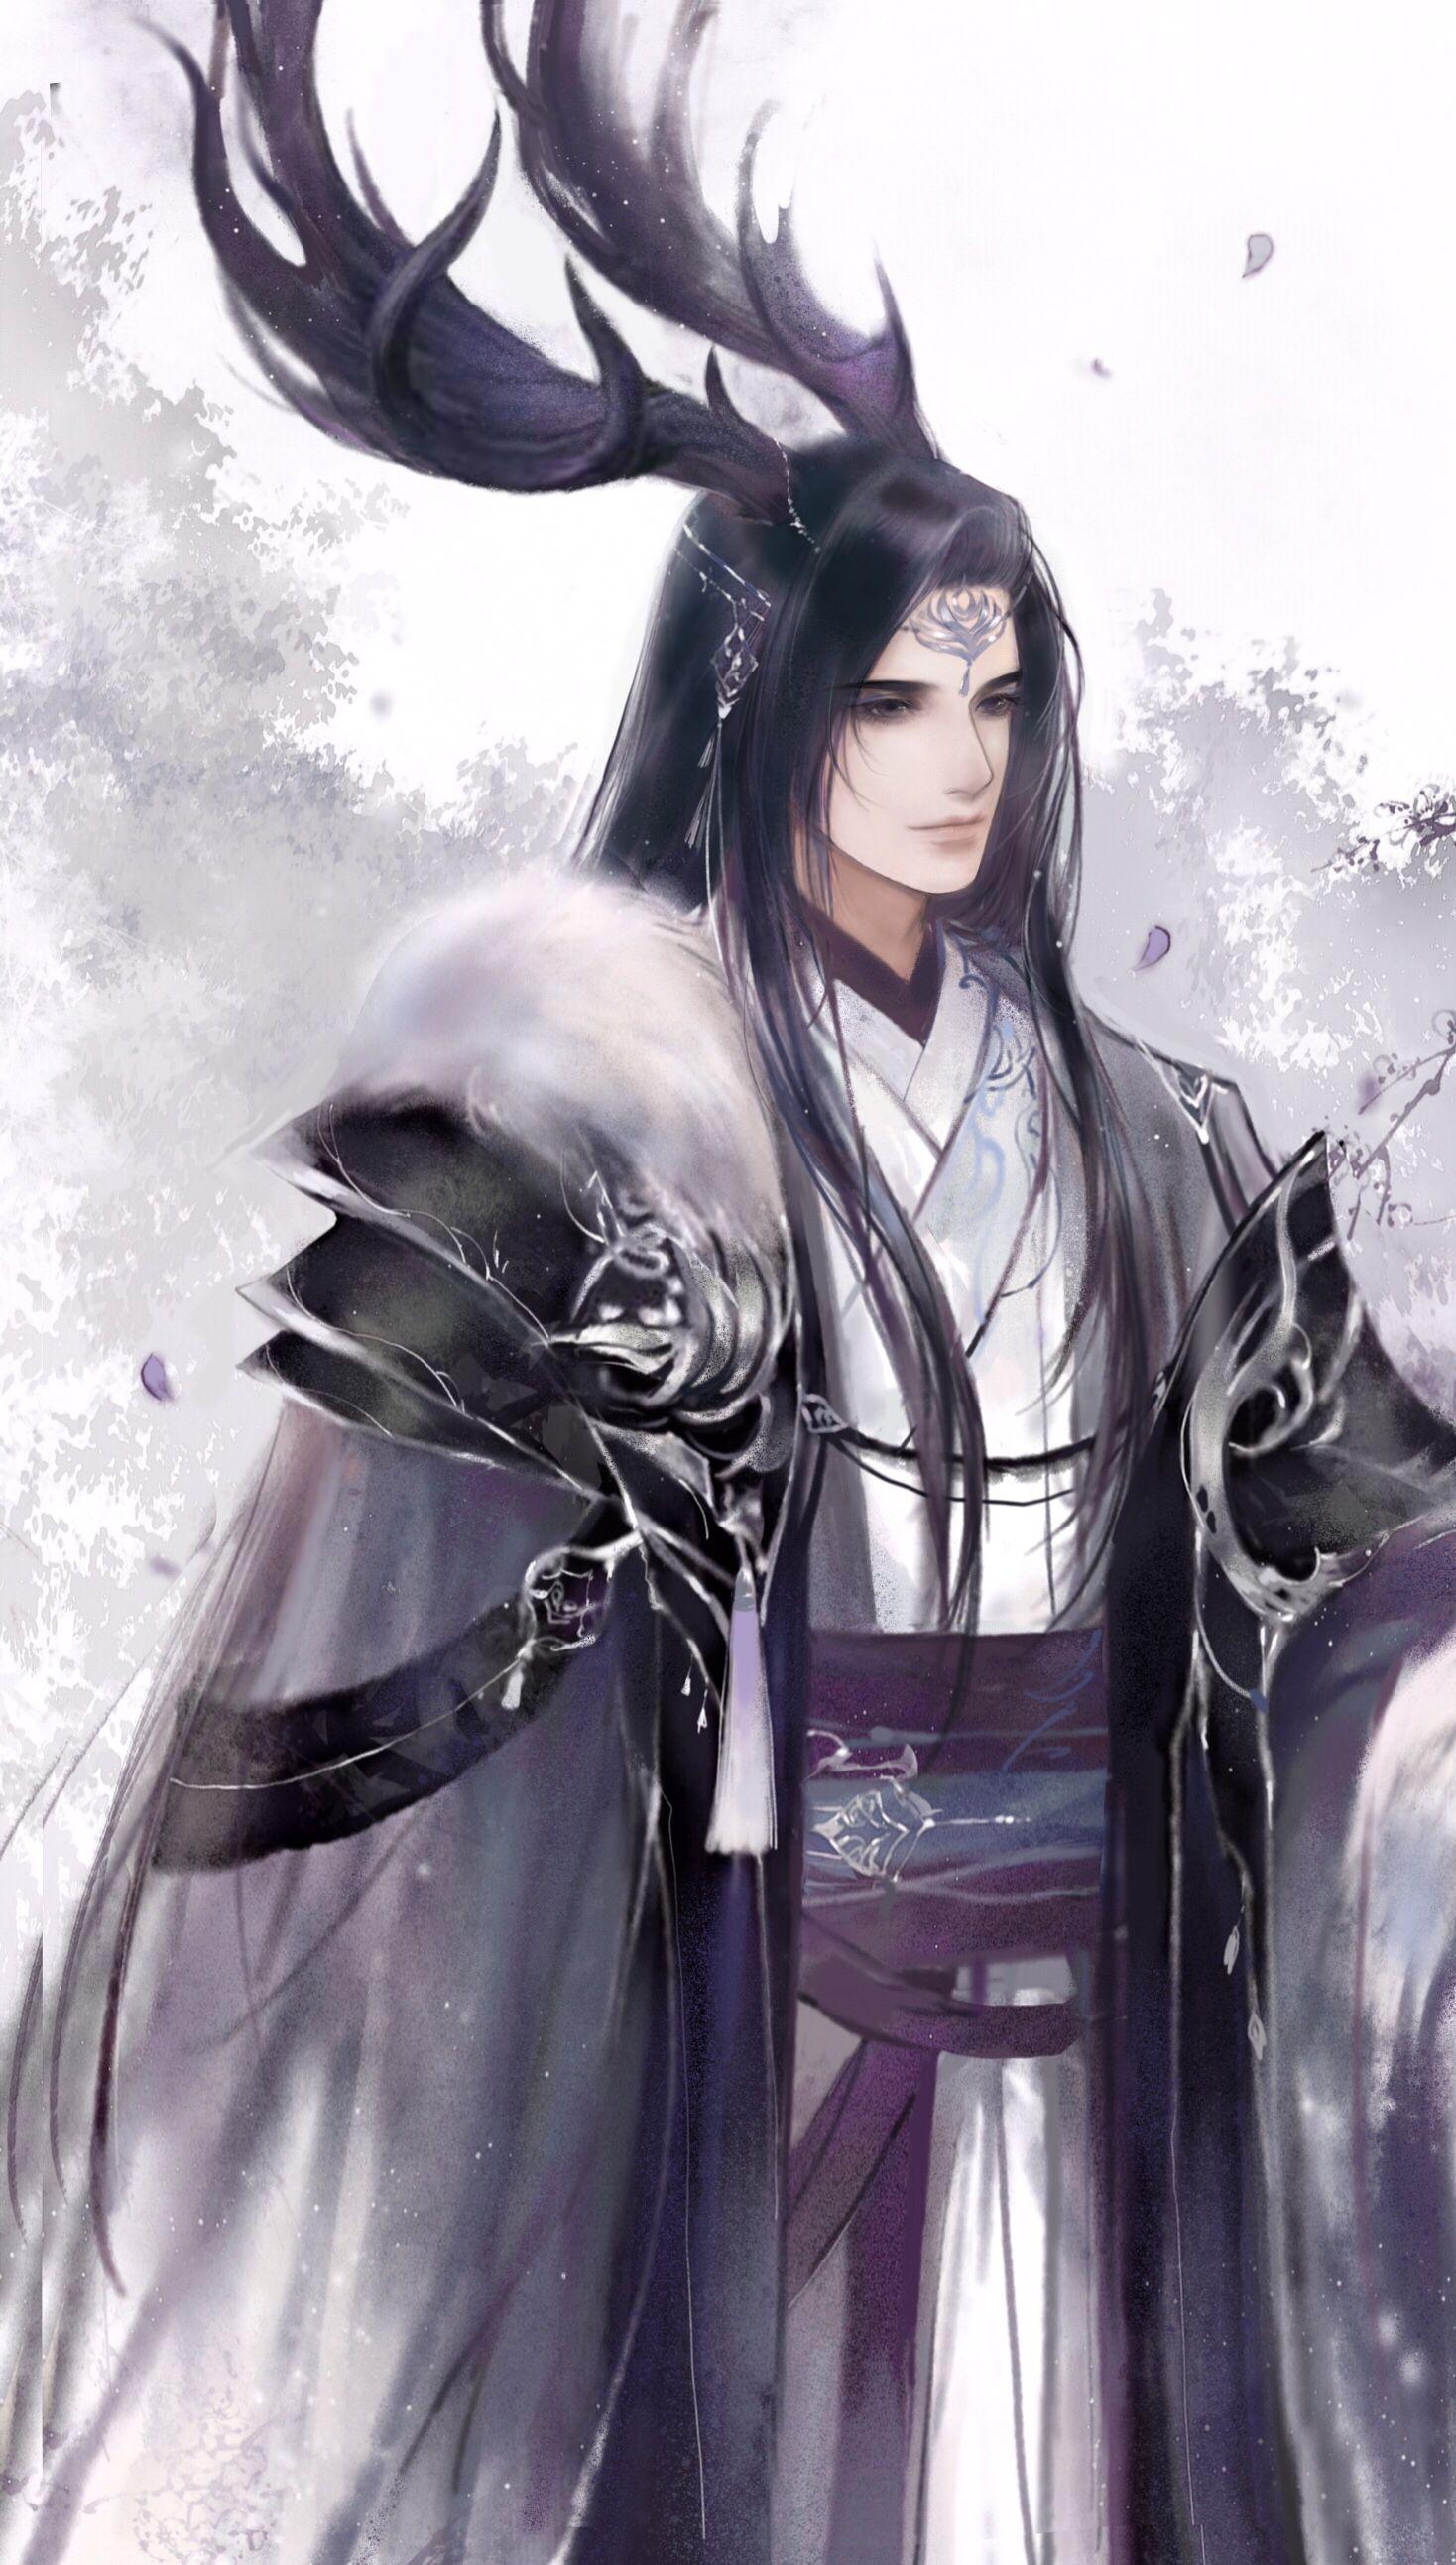 Pin By Eun Kyoung On Trung Cổ Fantasy Art Men Art Character Art